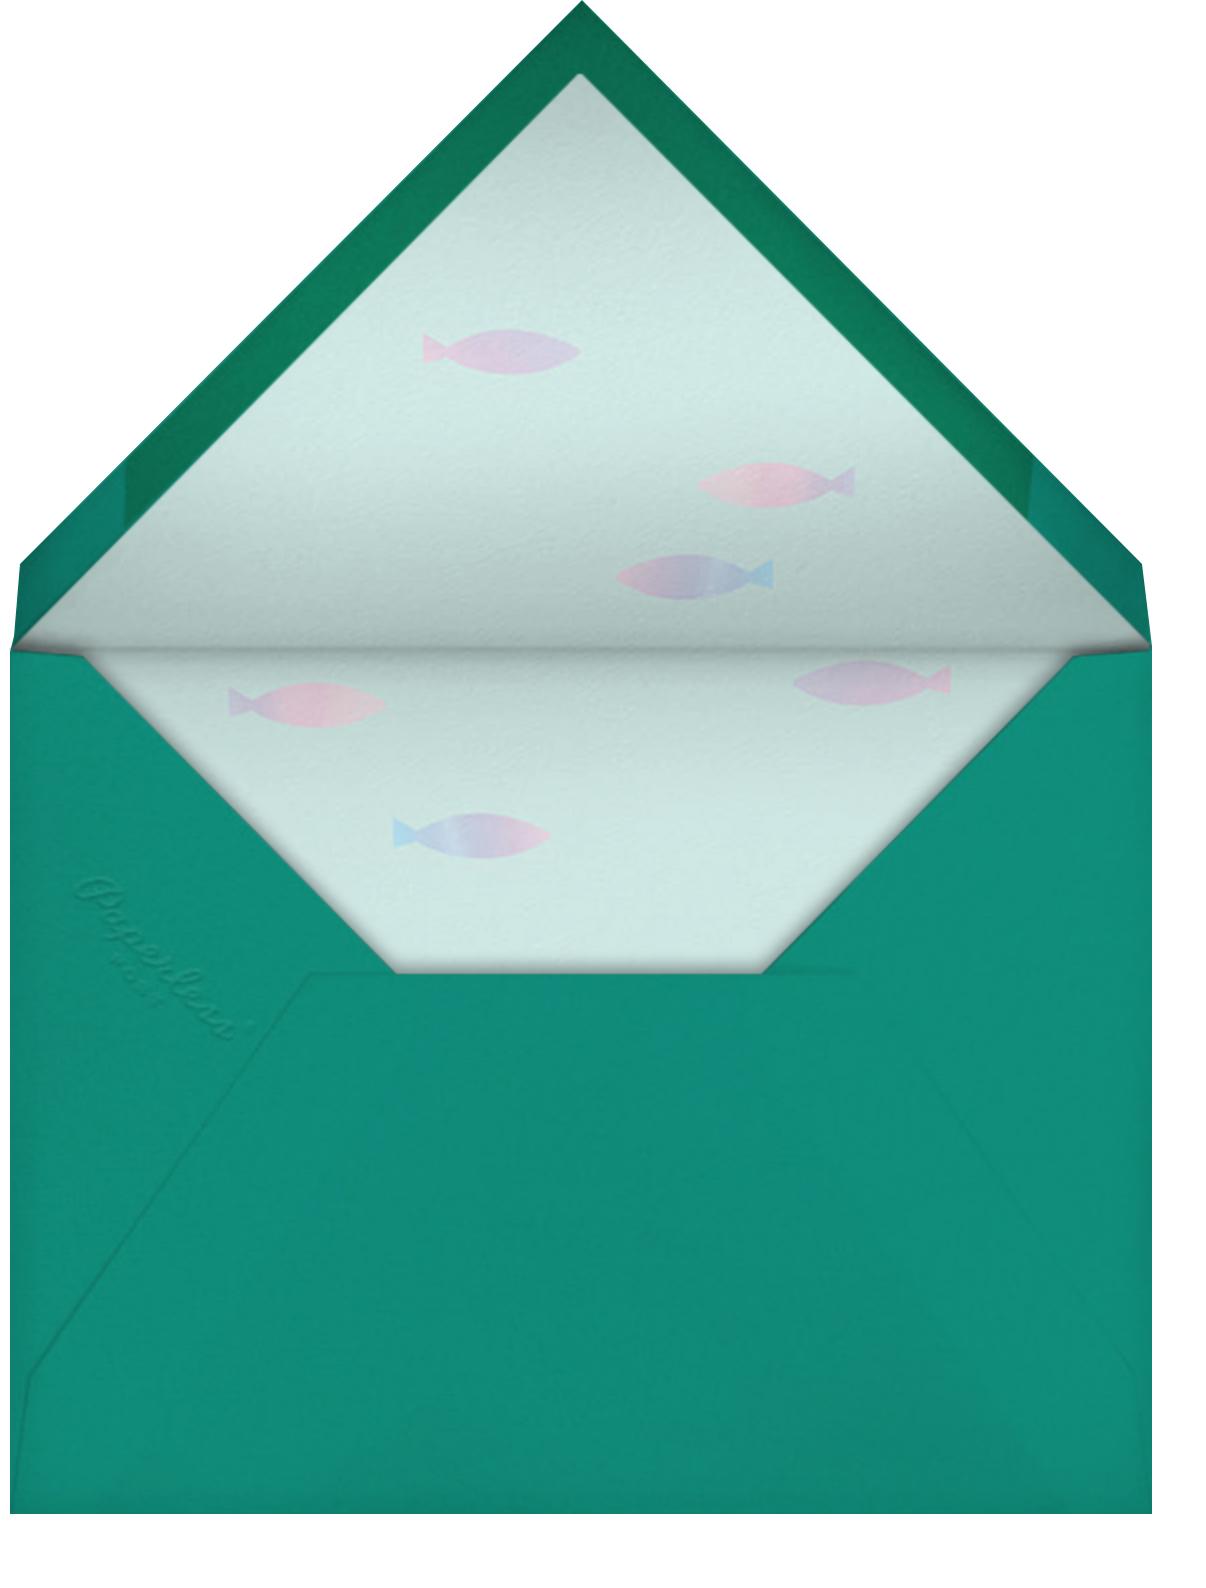 Let's Shellebrate - Mocha - Meri Meri - Kids' birthday - envelope back